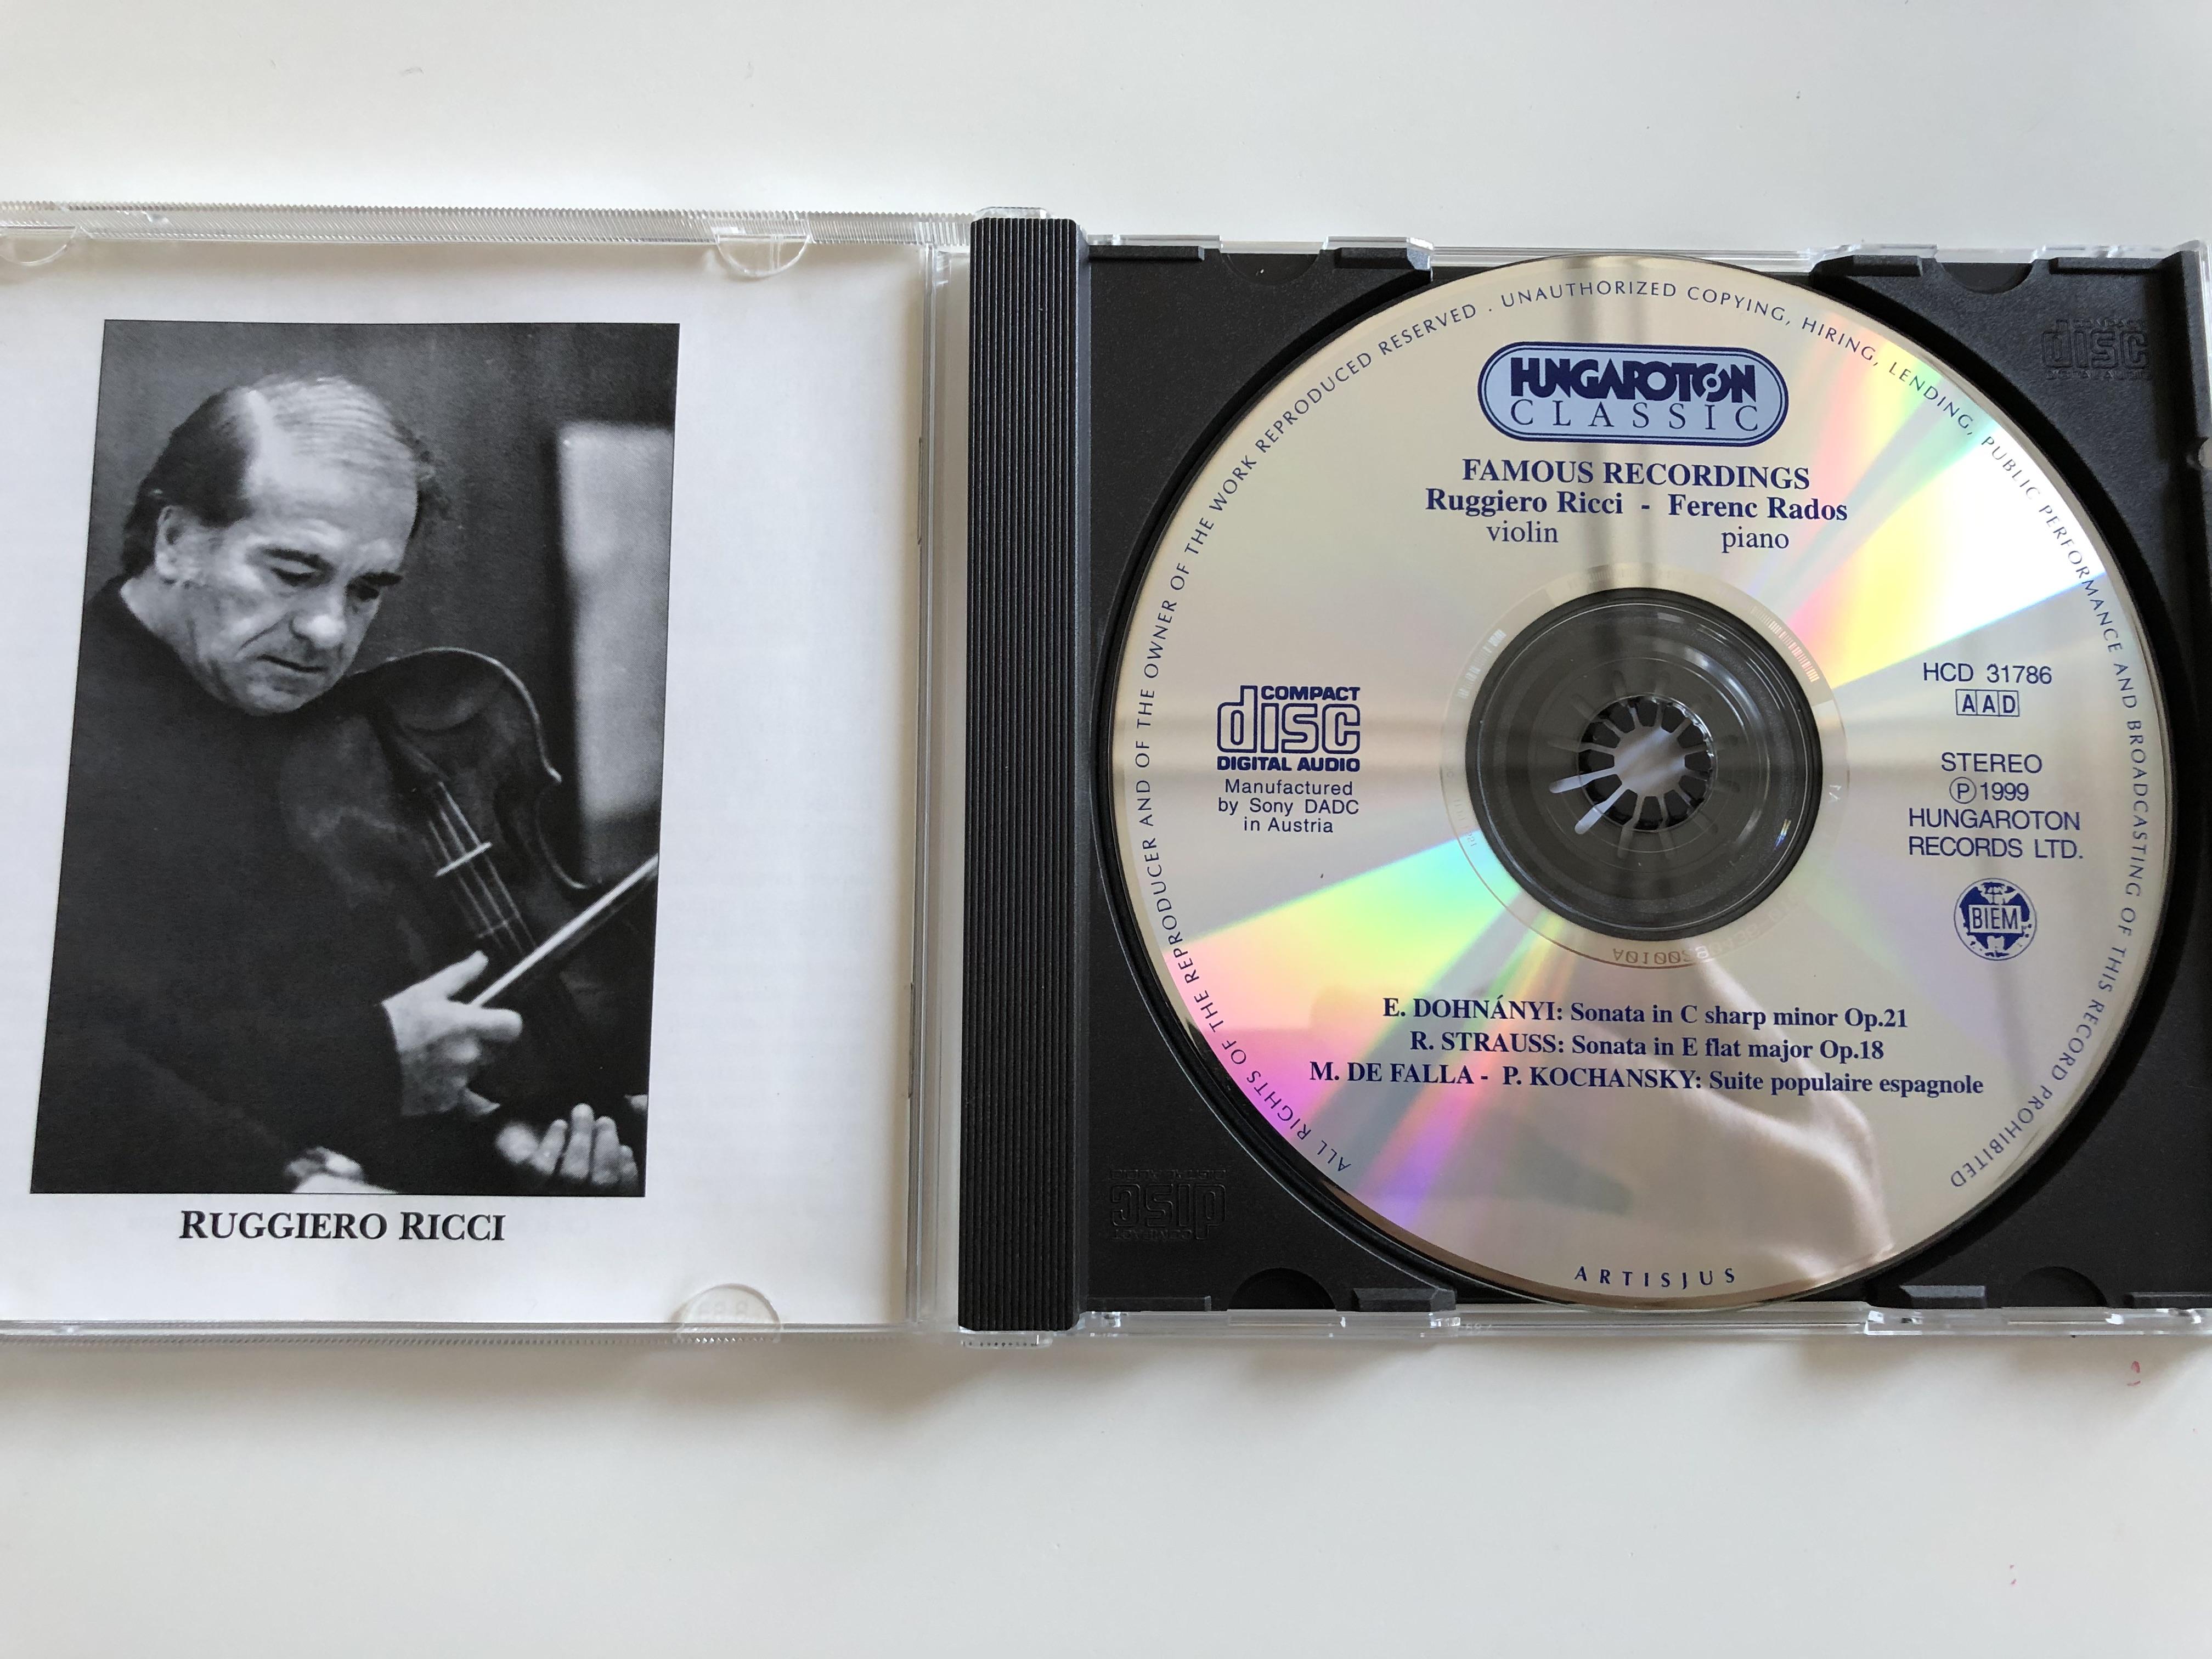 dohnanyi-r.-strauss-de-falla-played-by-ruggiero-ricci-violin-ferenc-rados-piano-hungaroton-classic-audio-cd-1999-stereo-hcd-31786-6-.jpg